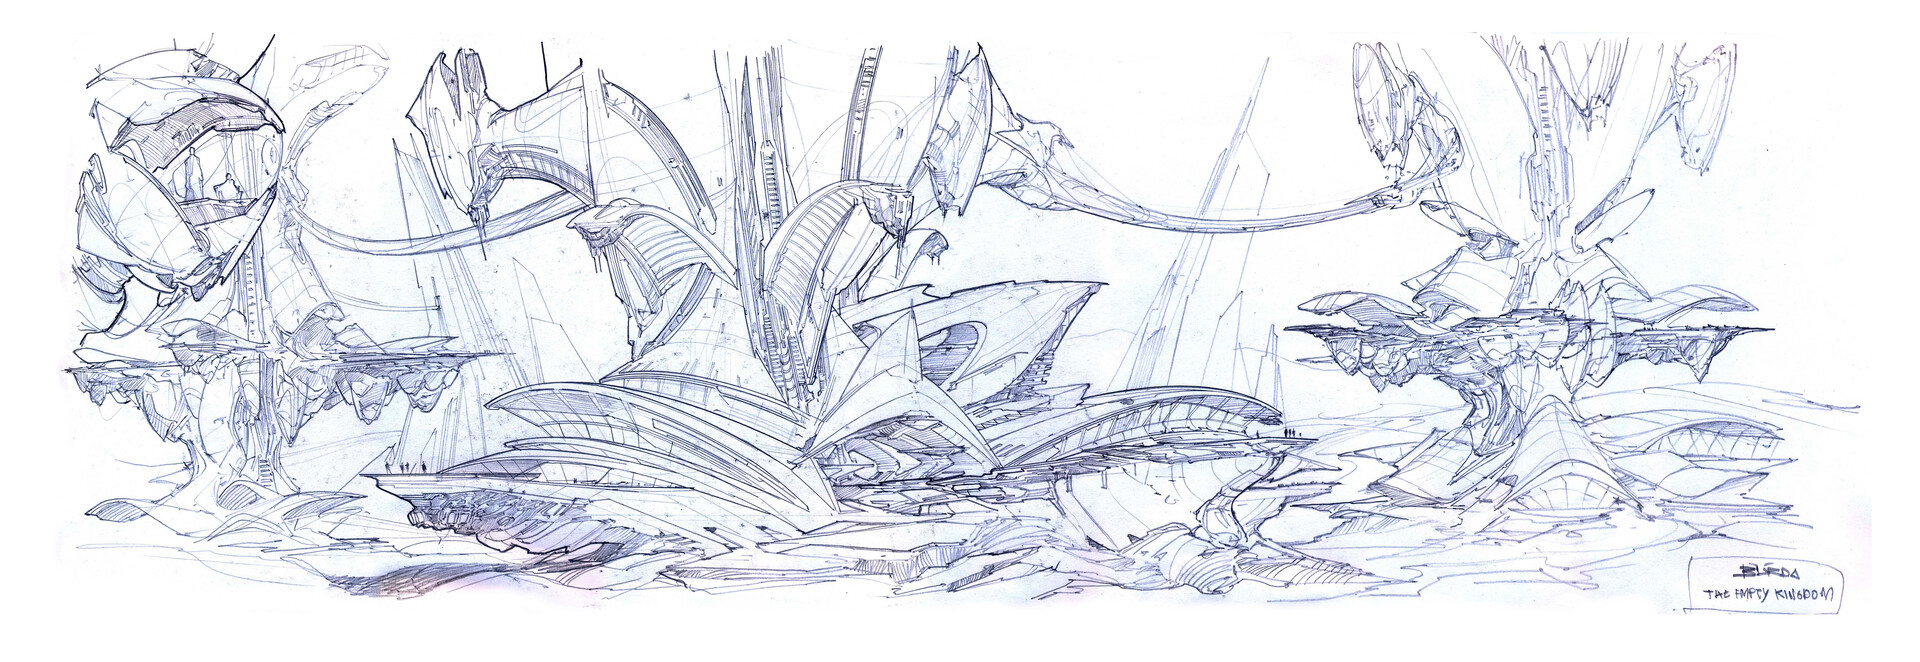 Alejandro burdisio bocetos the empty kingdom arcadia2